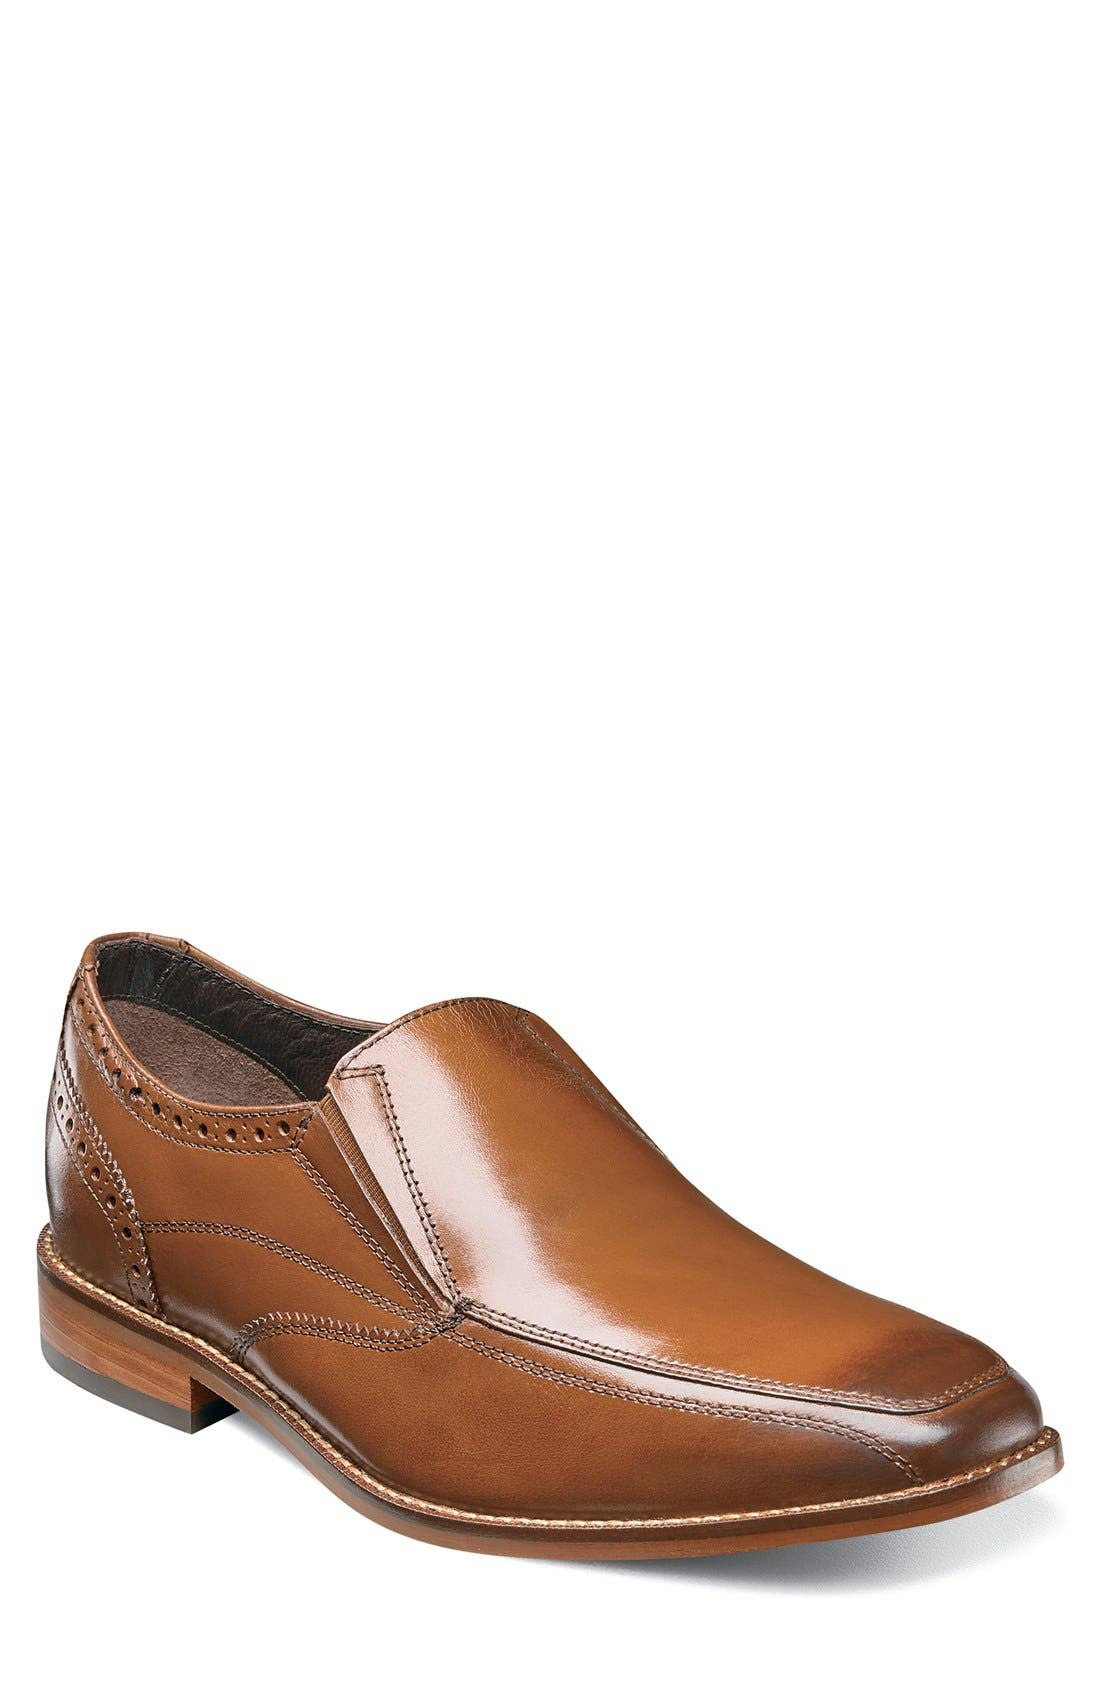 'Castellano' Venetian Loafer,                             Main thumbnail 1, color,                             237